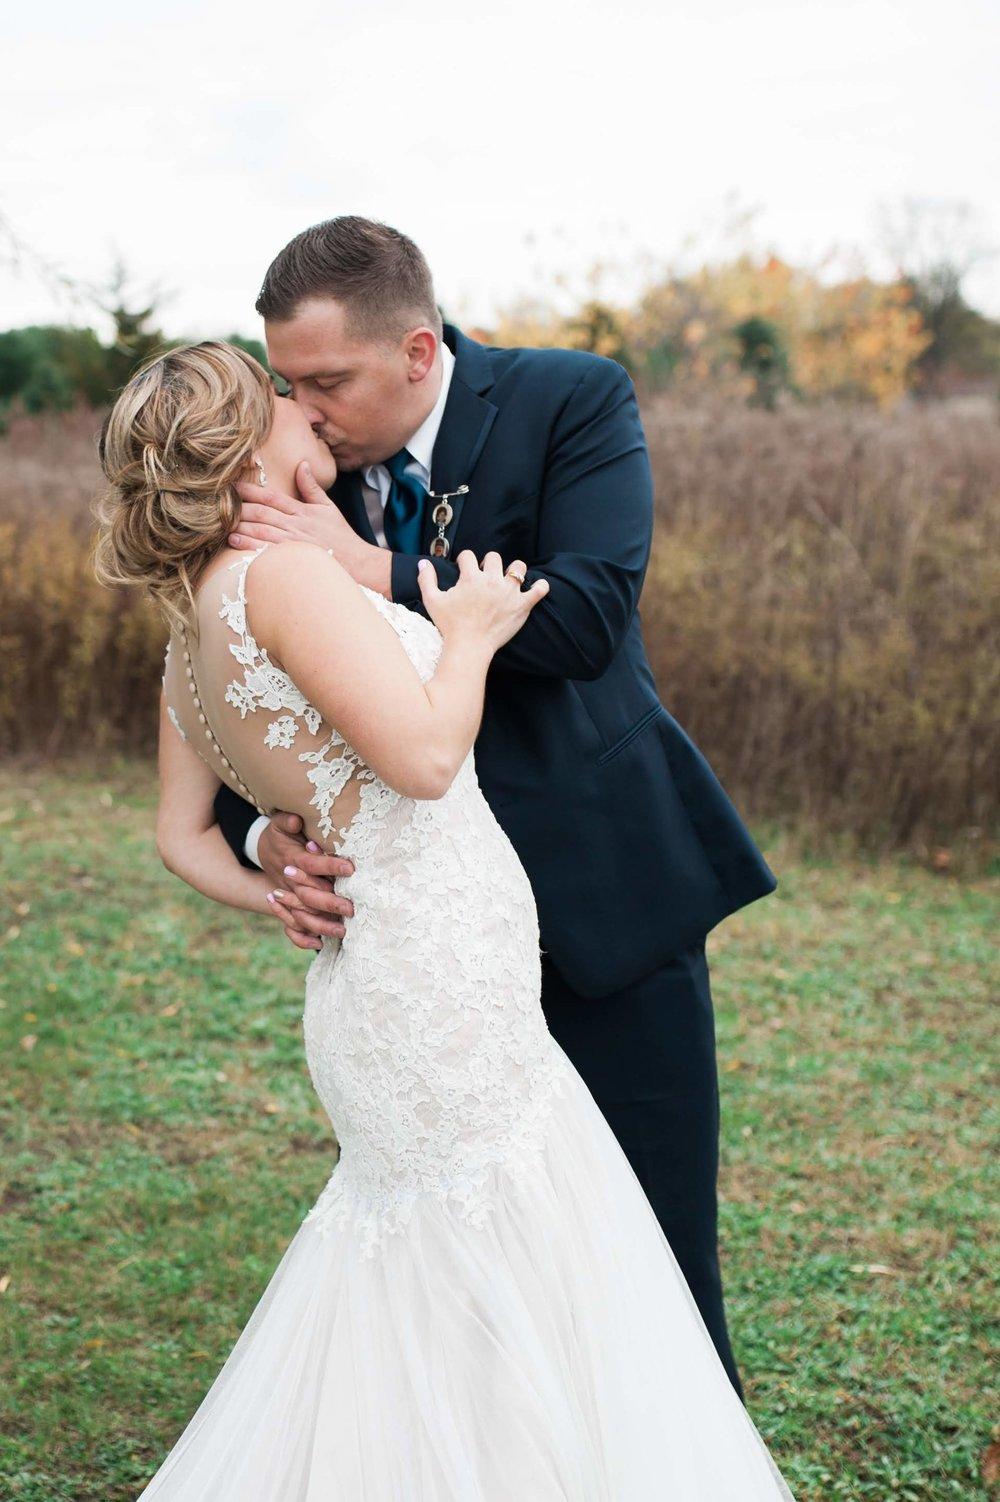 LLP Michigan Wedding Photographer 23.jpg